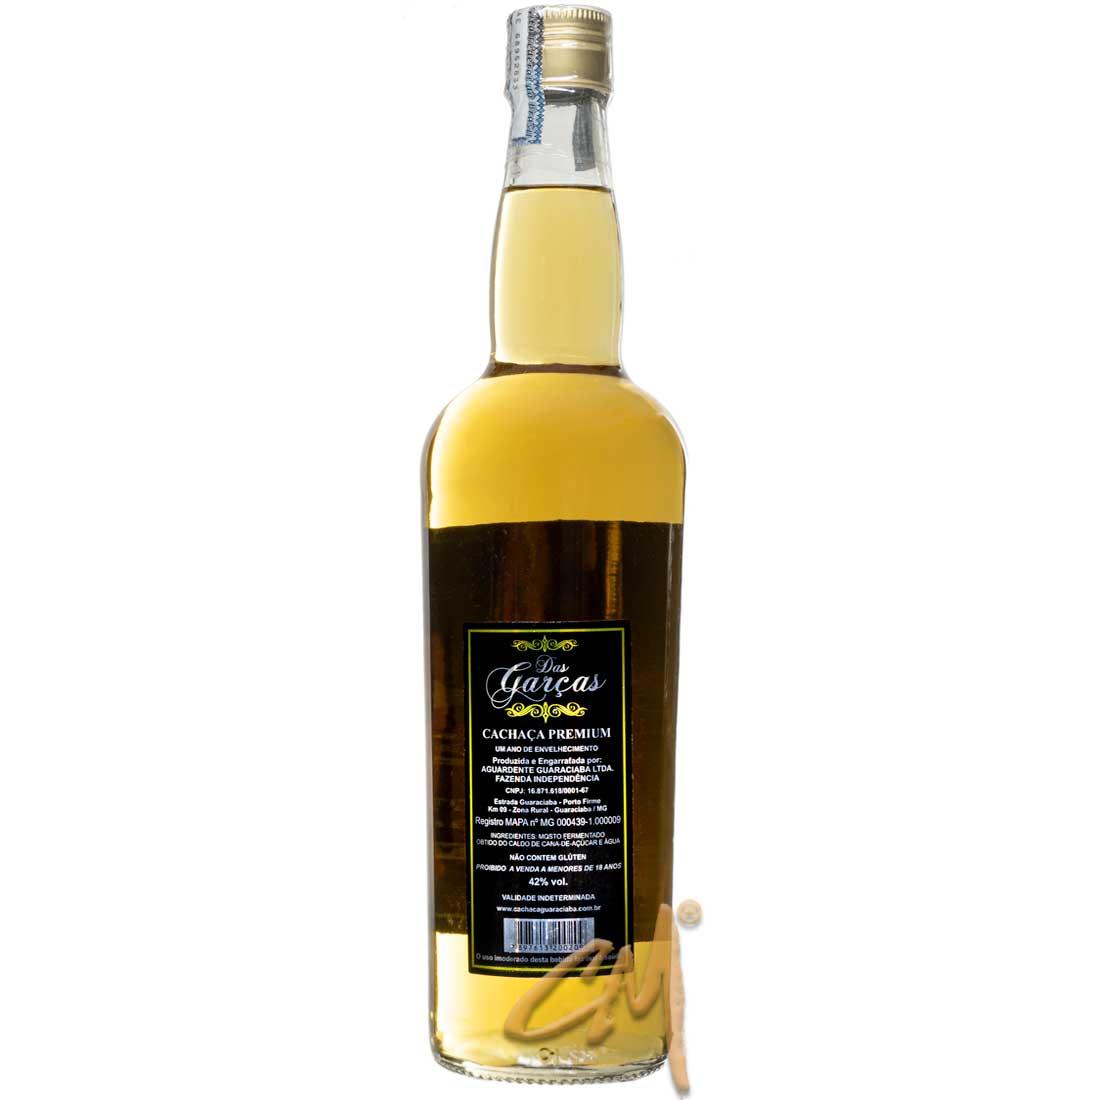 Cachaça Das Garças Premium 700 ml (Guaraciaba - MG)